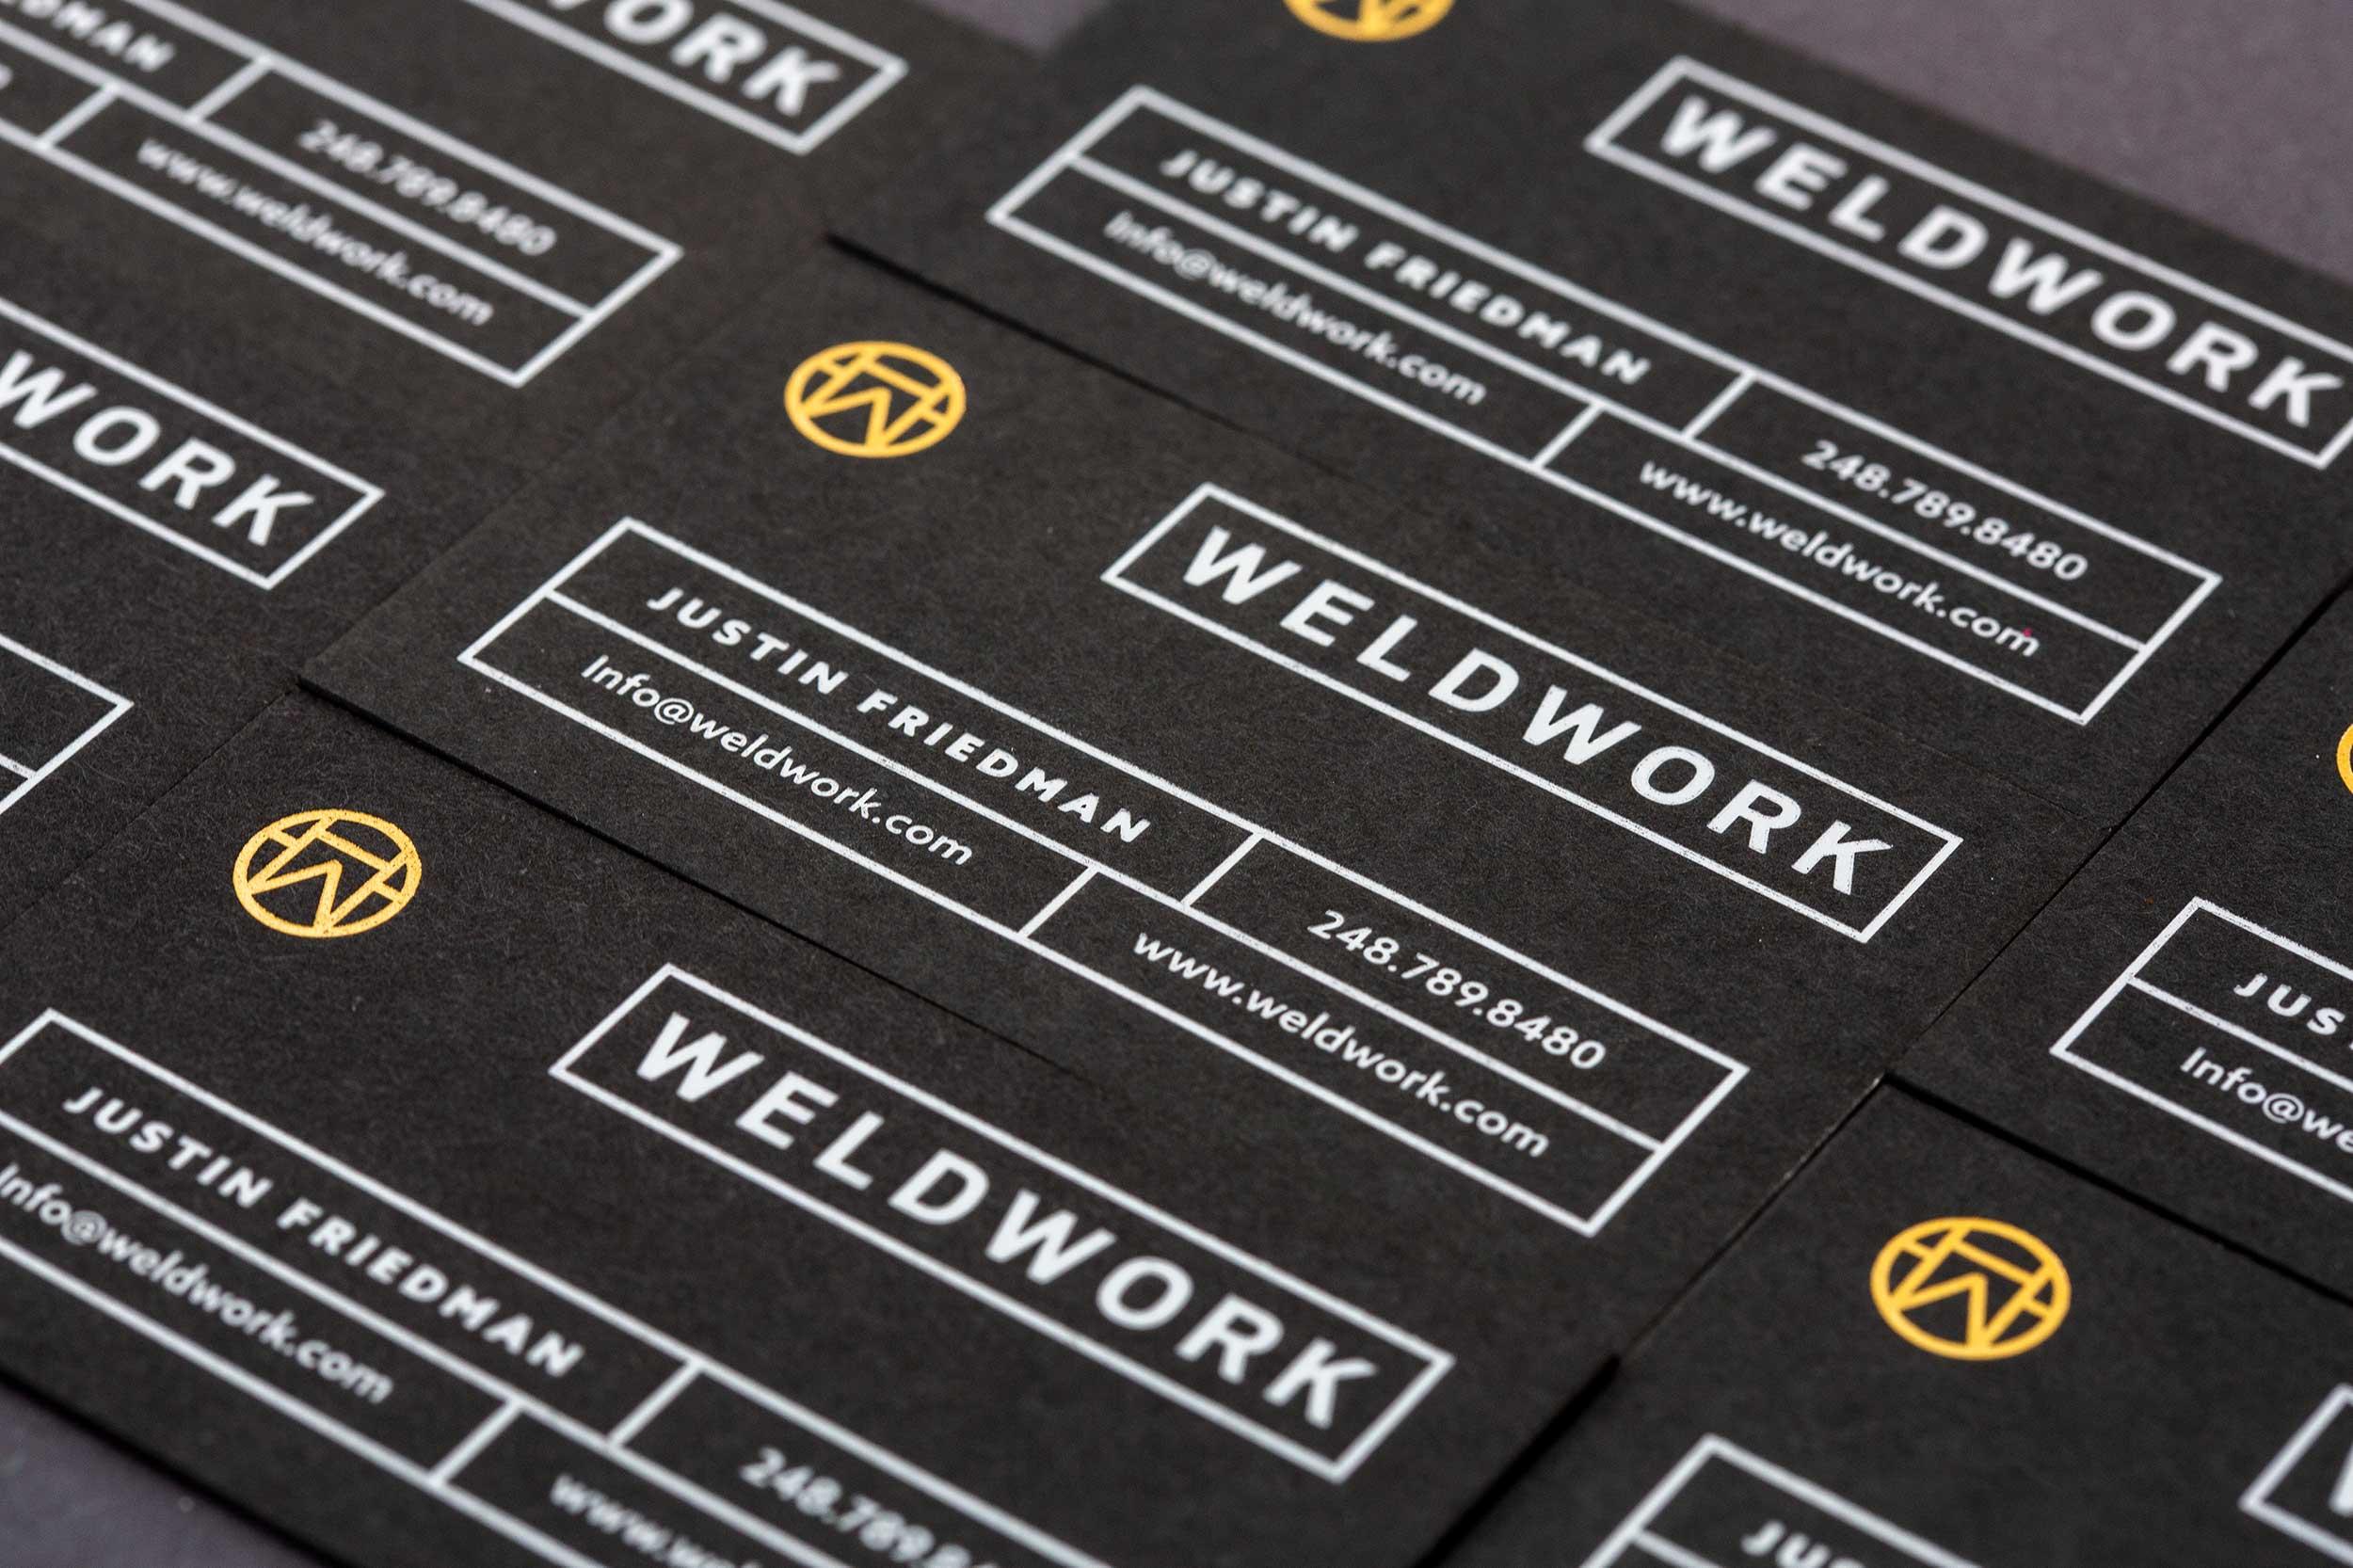 omit-studios-miami-weldwork-detroit-branding-1.jpg